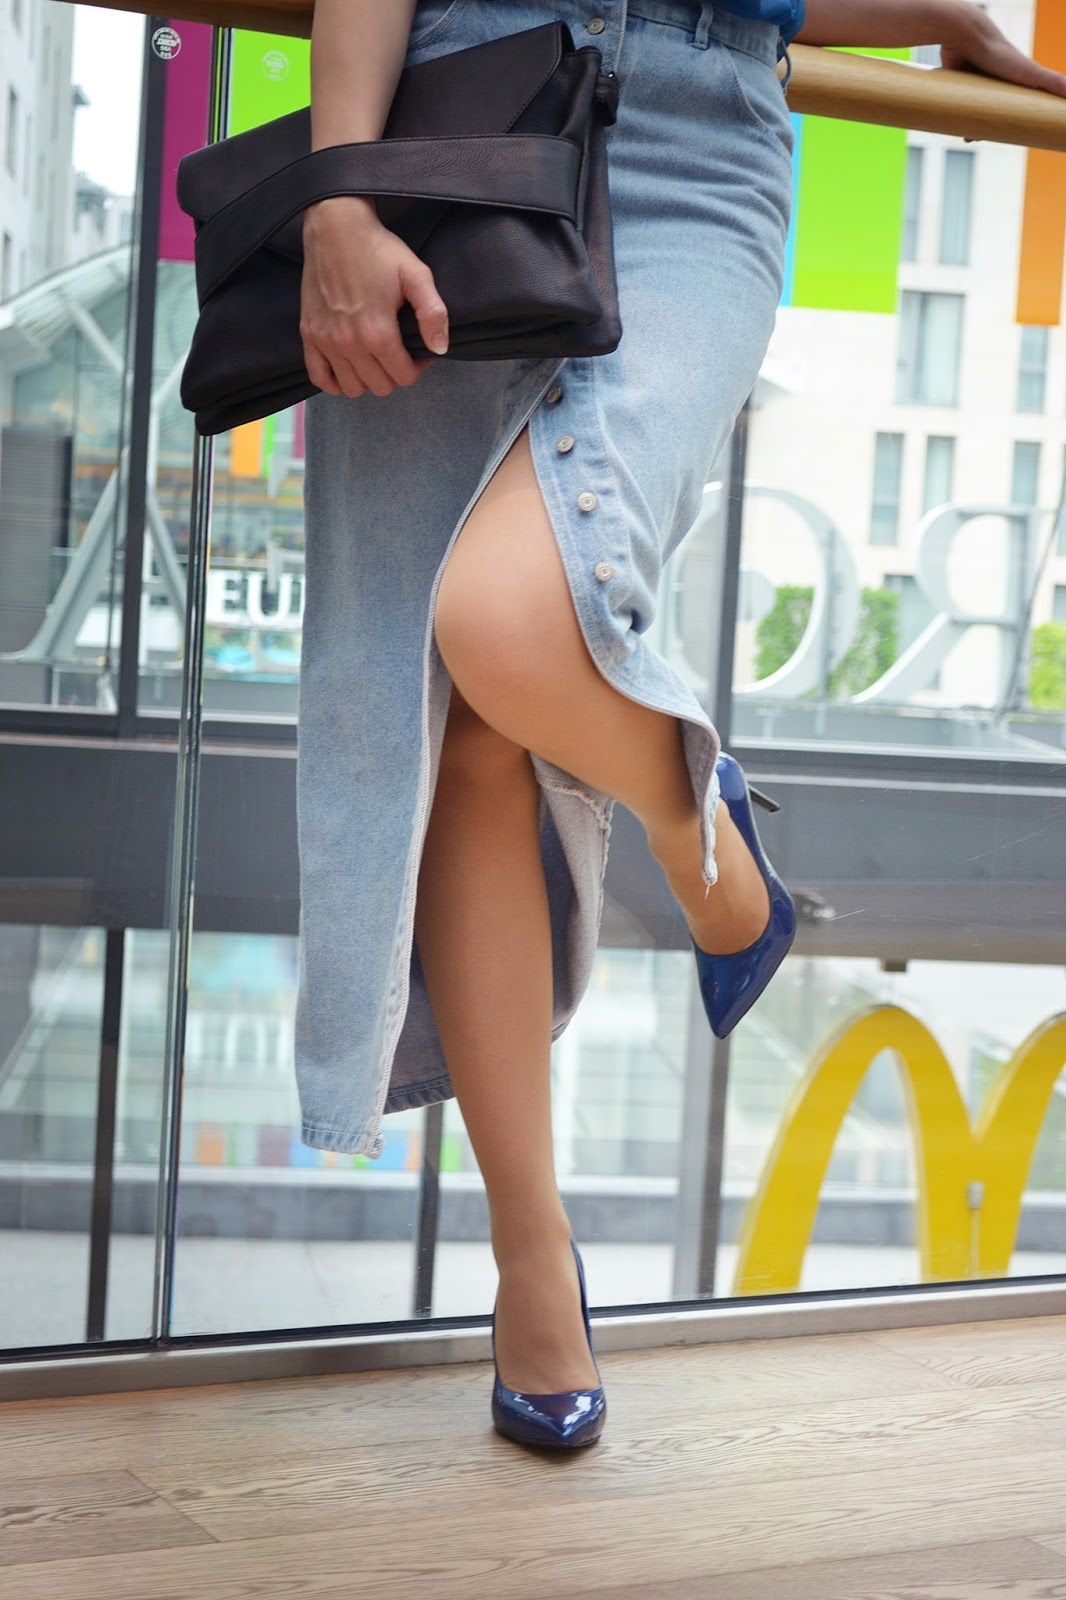 When old skirt becomes young again_Katharine-fashion is beautiful_Maxi denim sukňa_Modré lakované lodičky_Čierna listová kabelka_Katarína Jakubčová_Fashion blogger